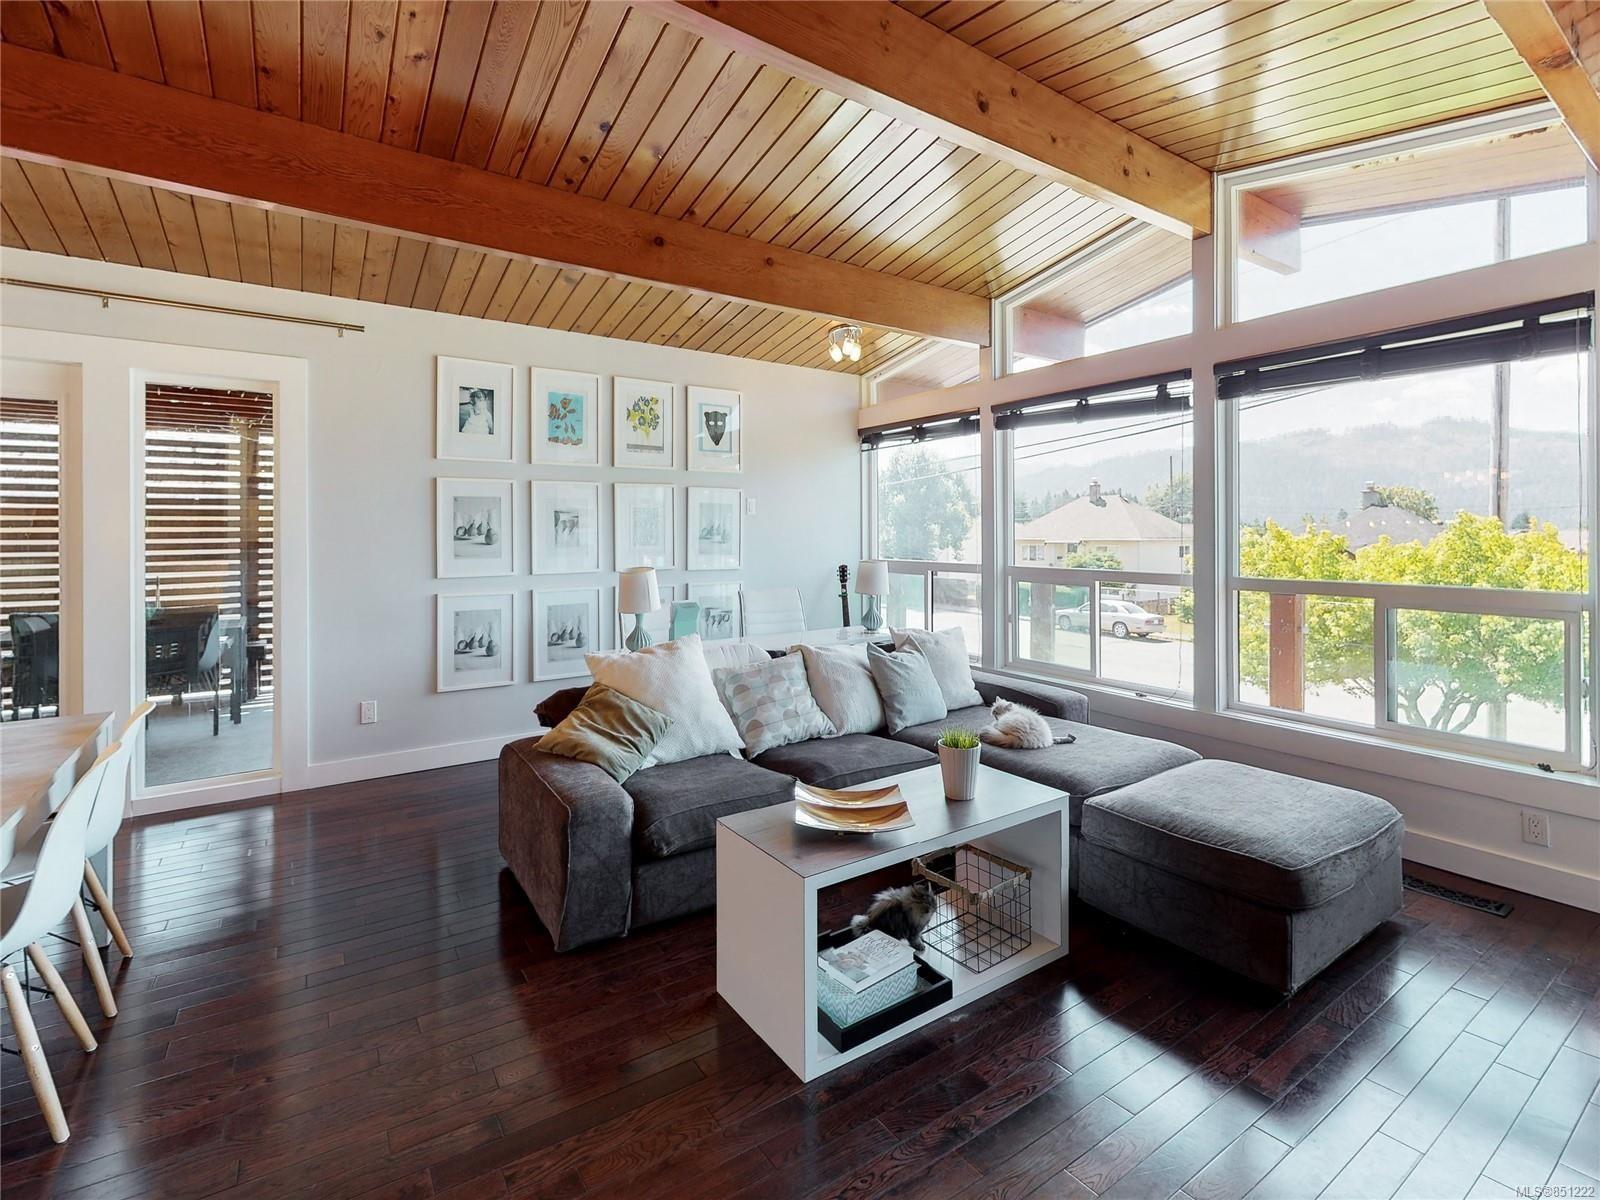 Photo 4: Photos: 2525 11th Ave in : PA Port Alberni House for sale (Port Alberni)  : MLS®# 851222